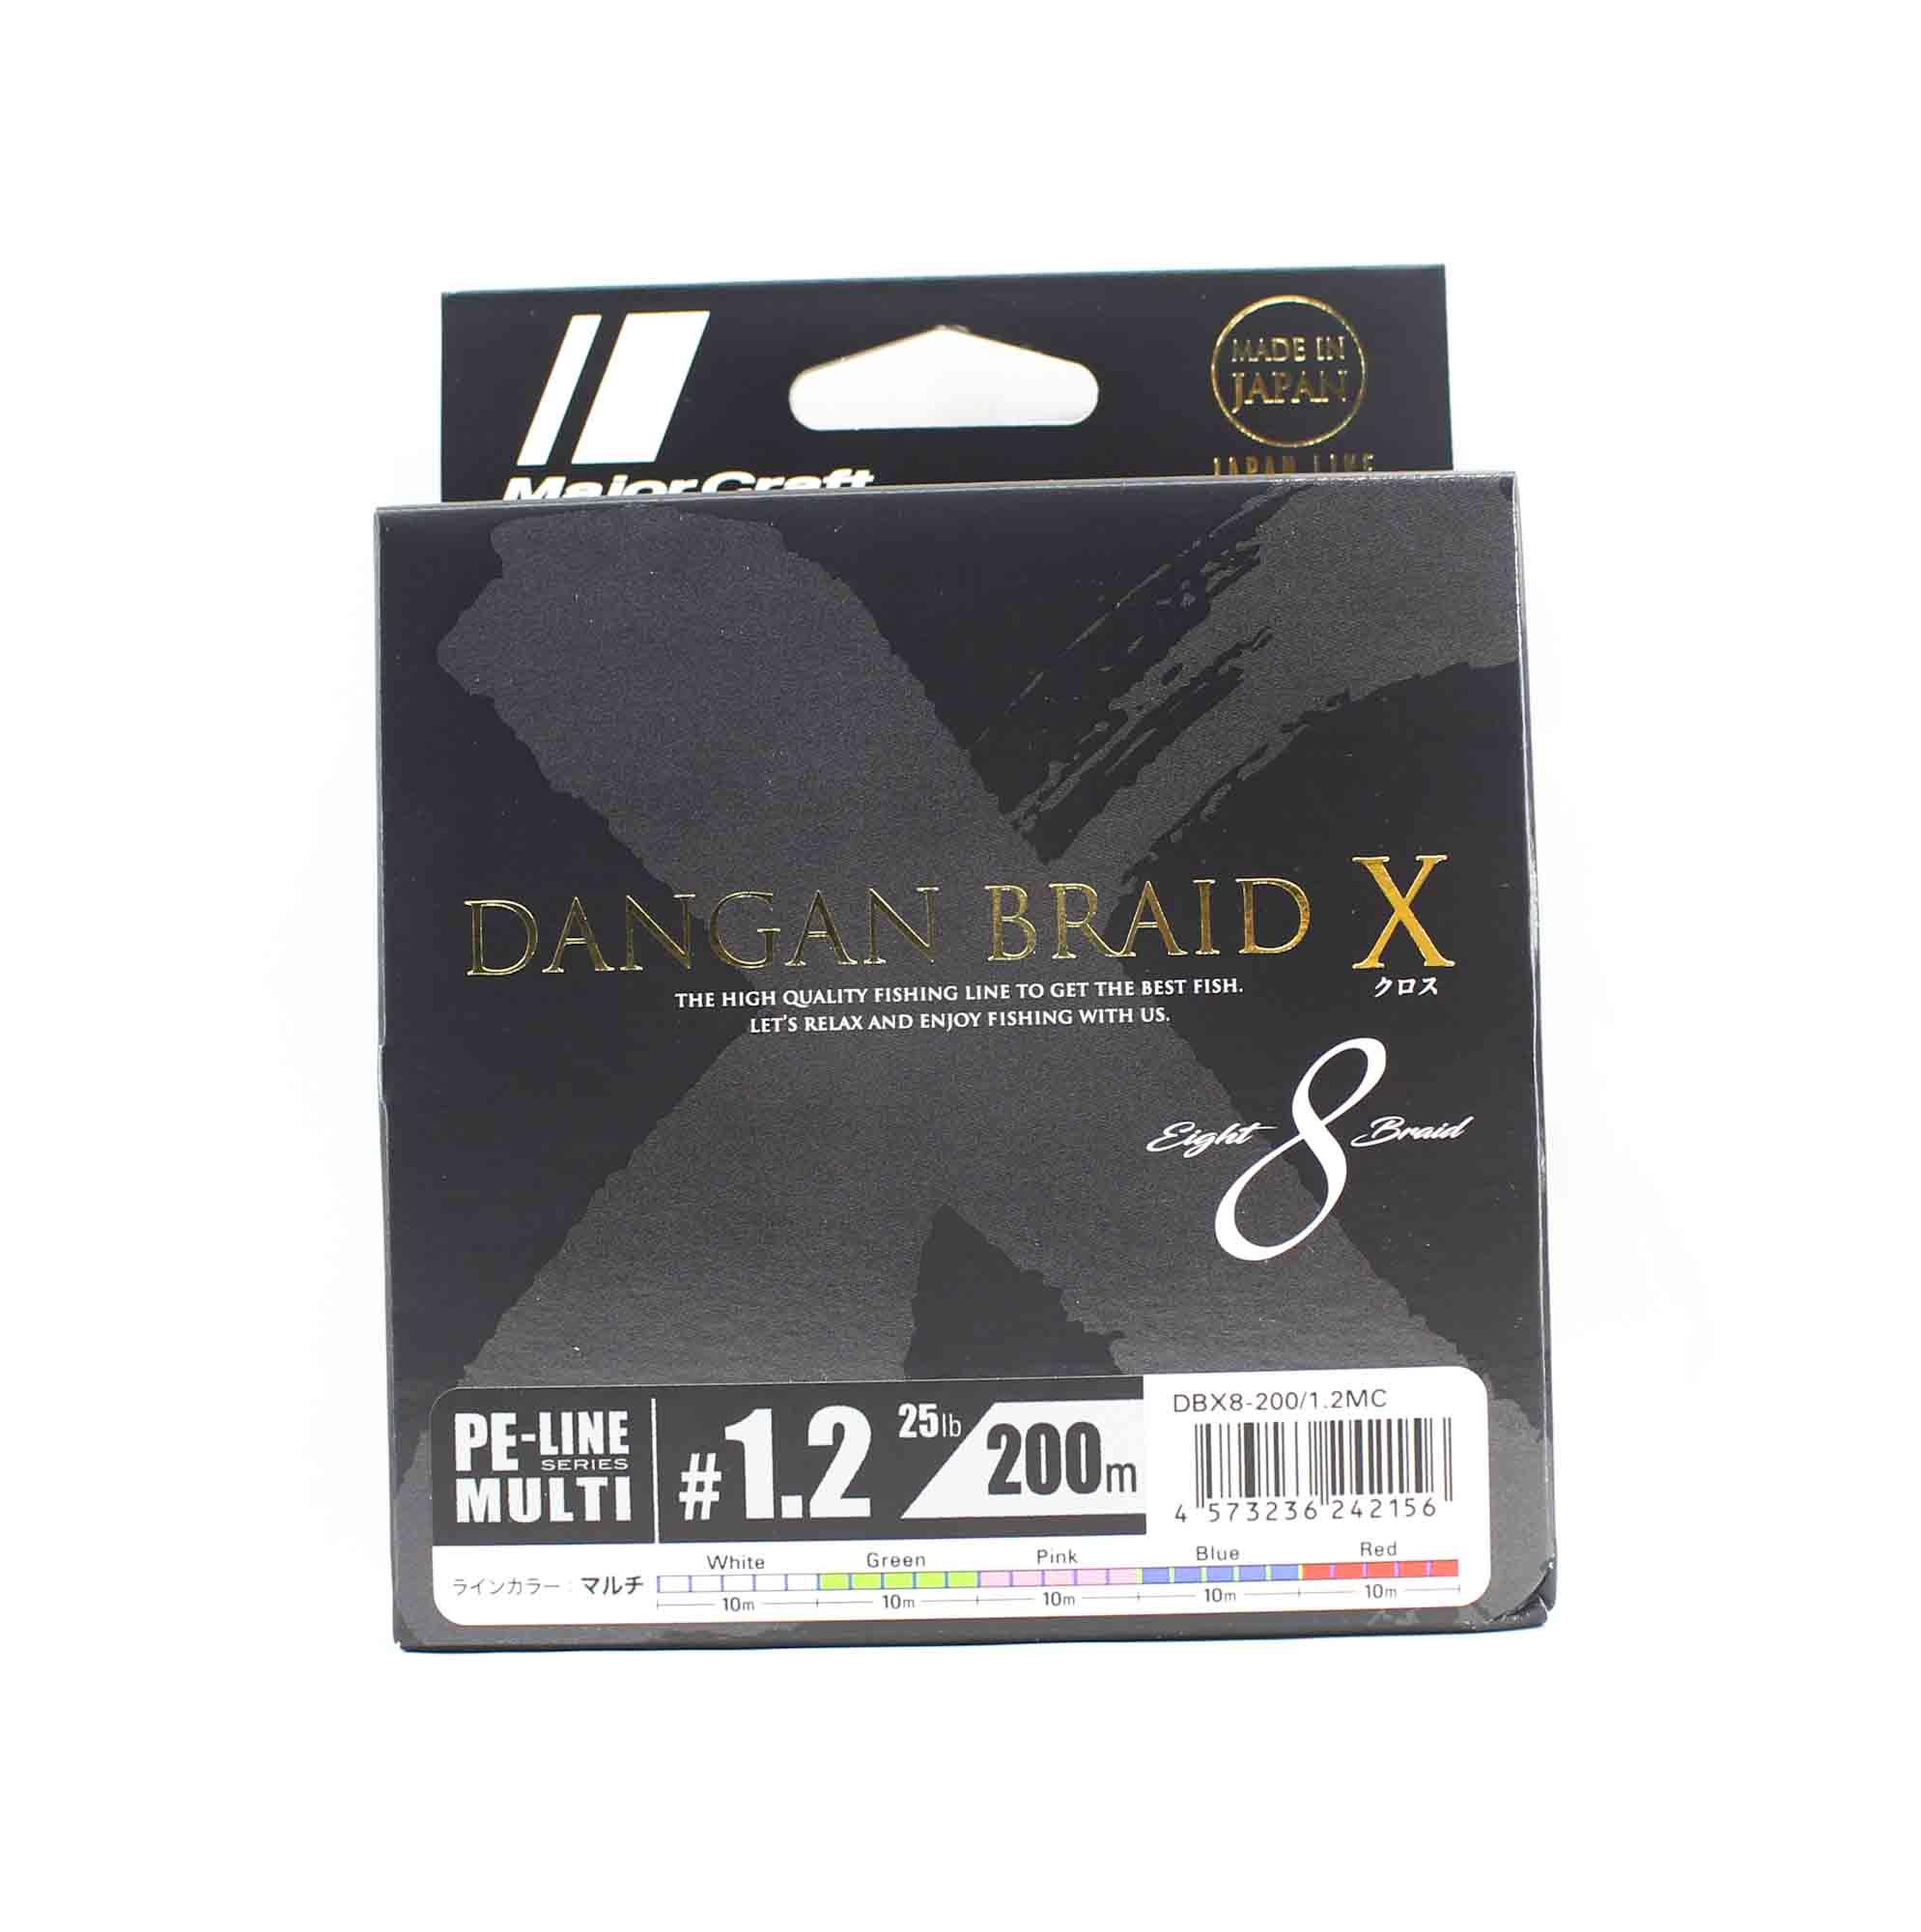 Major Craft Dangan Braid X Line X8 200m P.E 1.2 Multi DBX8-200/1.2MC (2156)